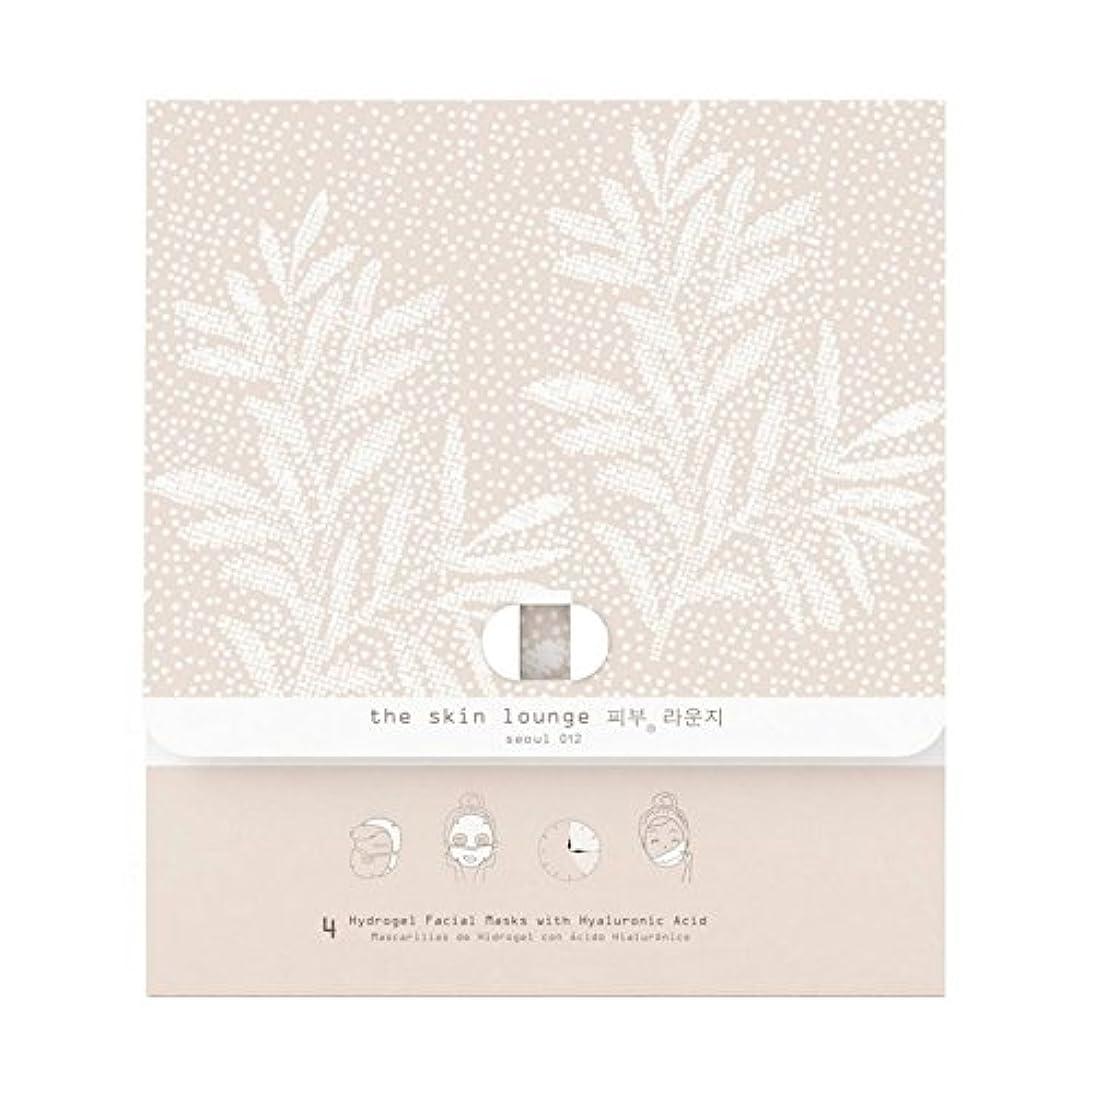 The Skin Lounge Hydrogel HA Pack of 6 (Pack of 6) - 4の皮膚ラウンジヒドロゲルヘクタールパック x6 [並行輸入品]